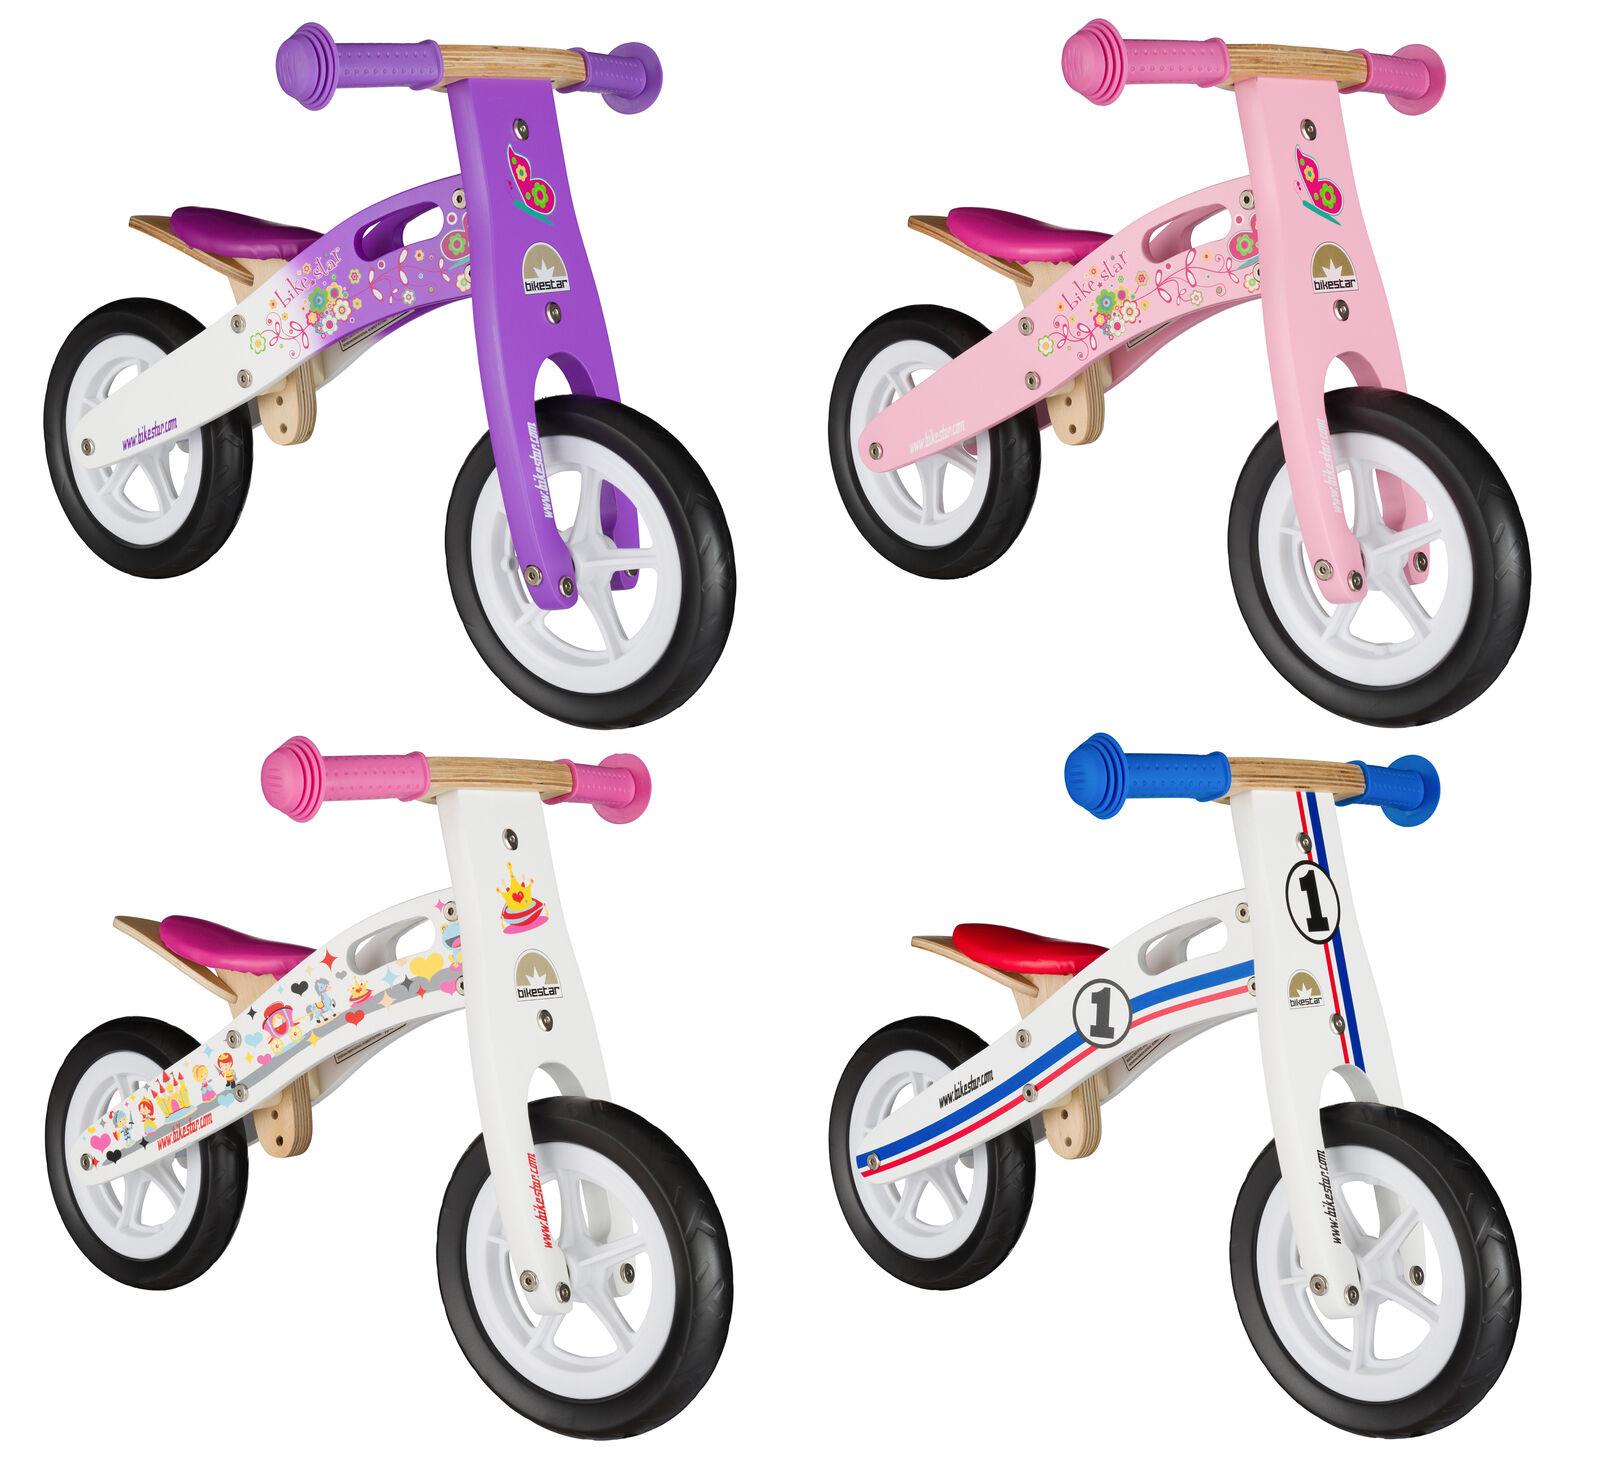 BIKESTAR Kinderlaufrad Kinder Laufrad Lauflernrad ab 2 Jahre   10 Zoll Holz